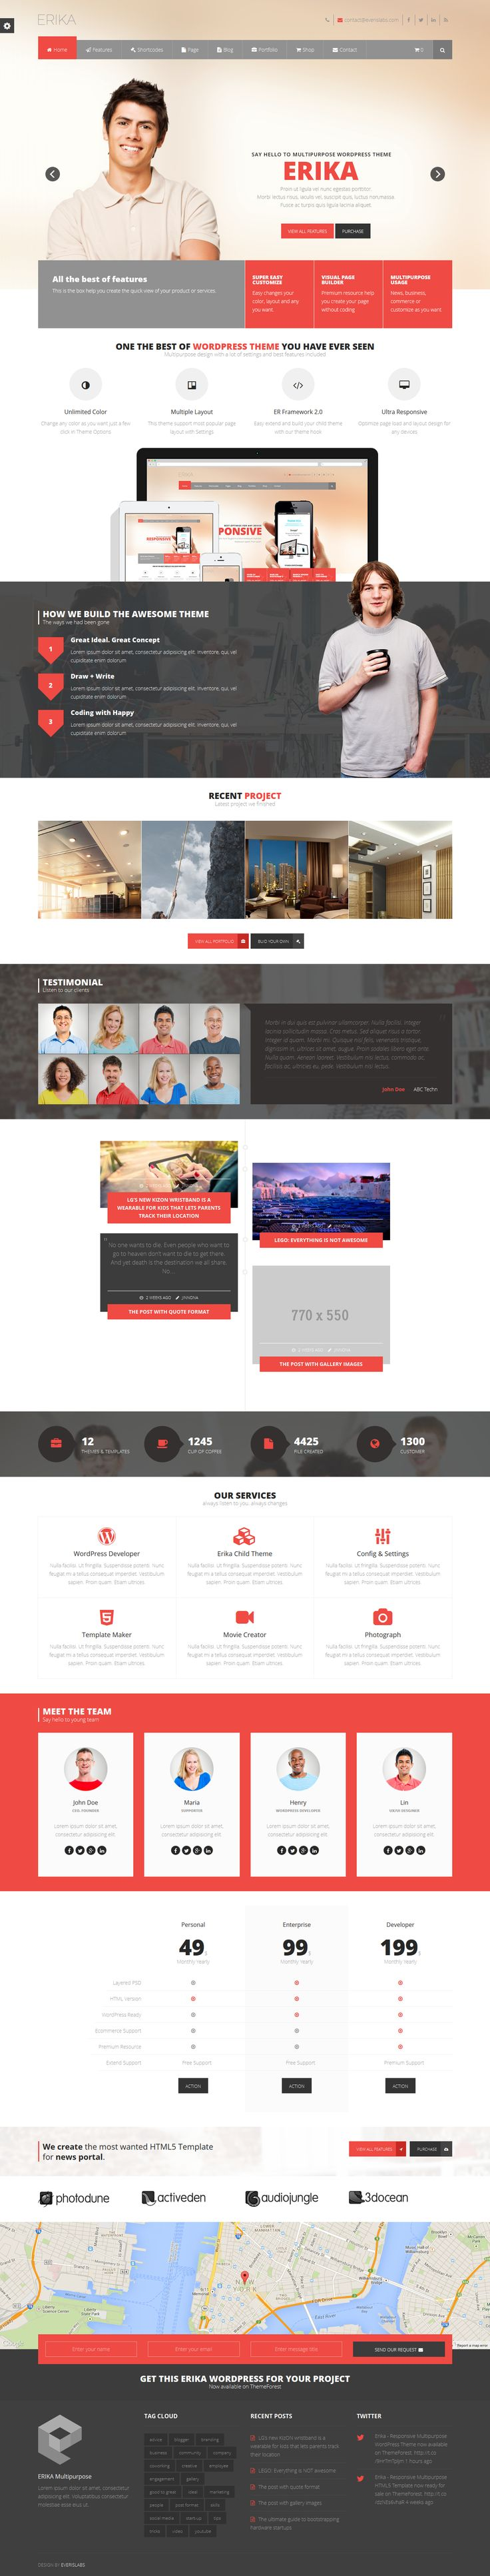 #Template #Responsive #Parallax #Wordpress, #joomla, #Magento, #Prestashop